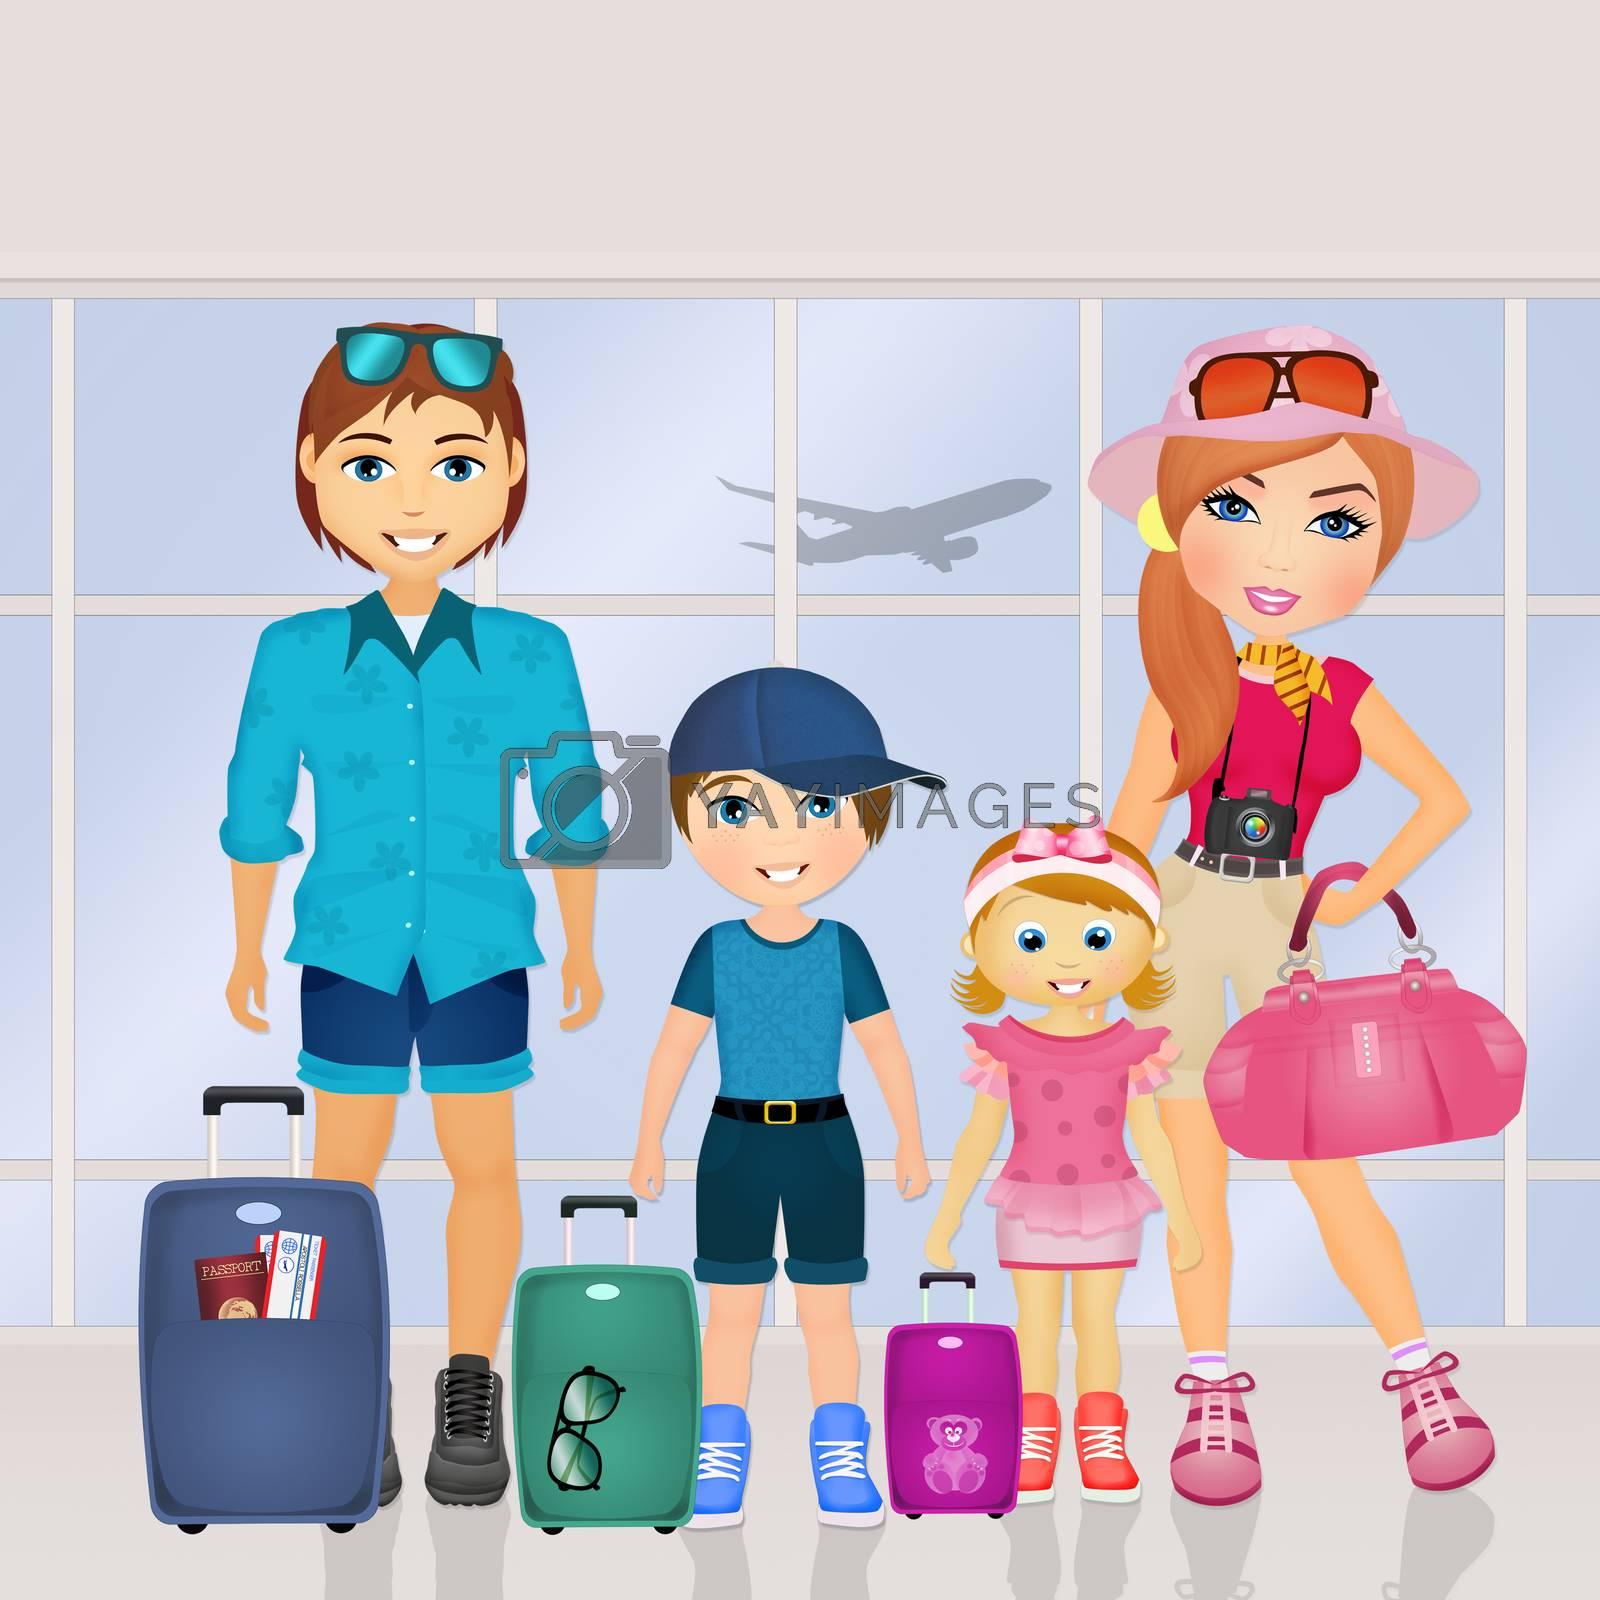 happy family on vacation by adrenalina